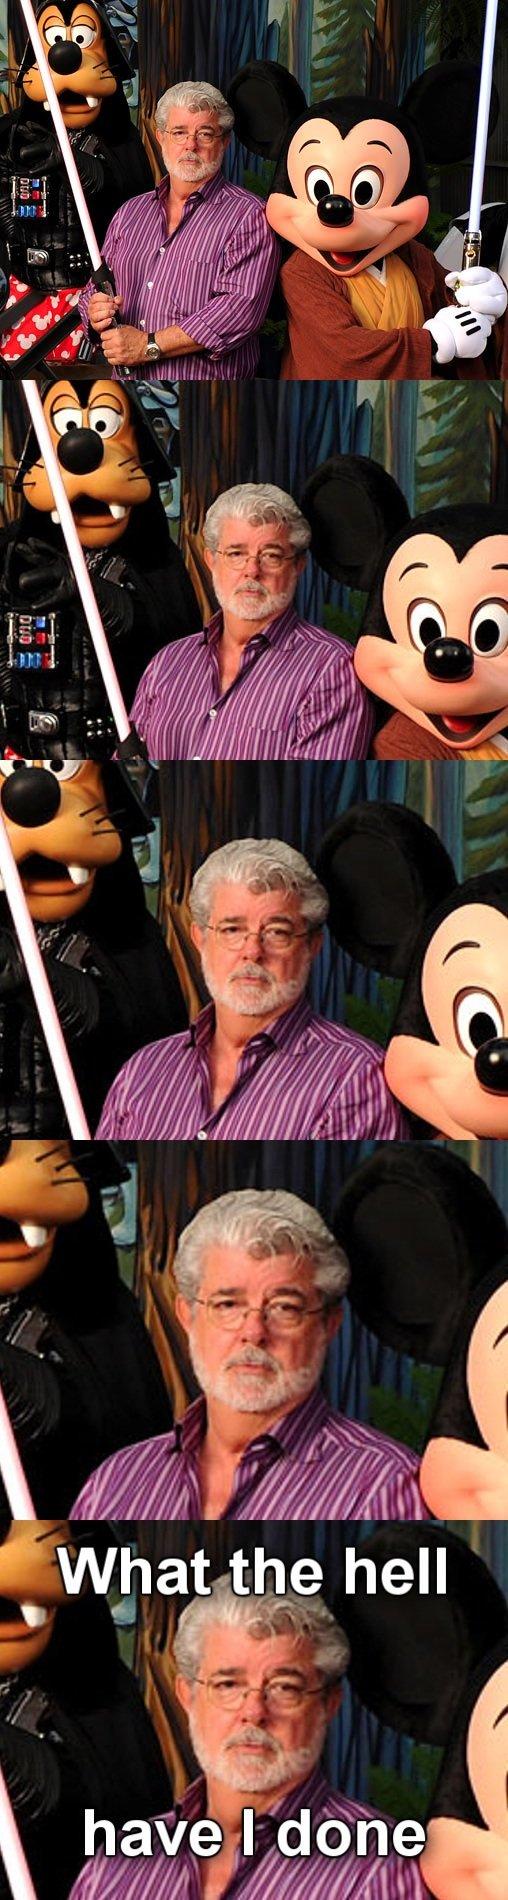 Disney. . iai, t,? hell. I just realized... Since Disney owns Starwars and Disney owns Disneyland... STAR WARS ROLLERCOASTER! YEAH! Disney iai t ? hell I just realized Since owns Starwars and Disneyland STAR WARS ROLLERCOASTER! YEAH!